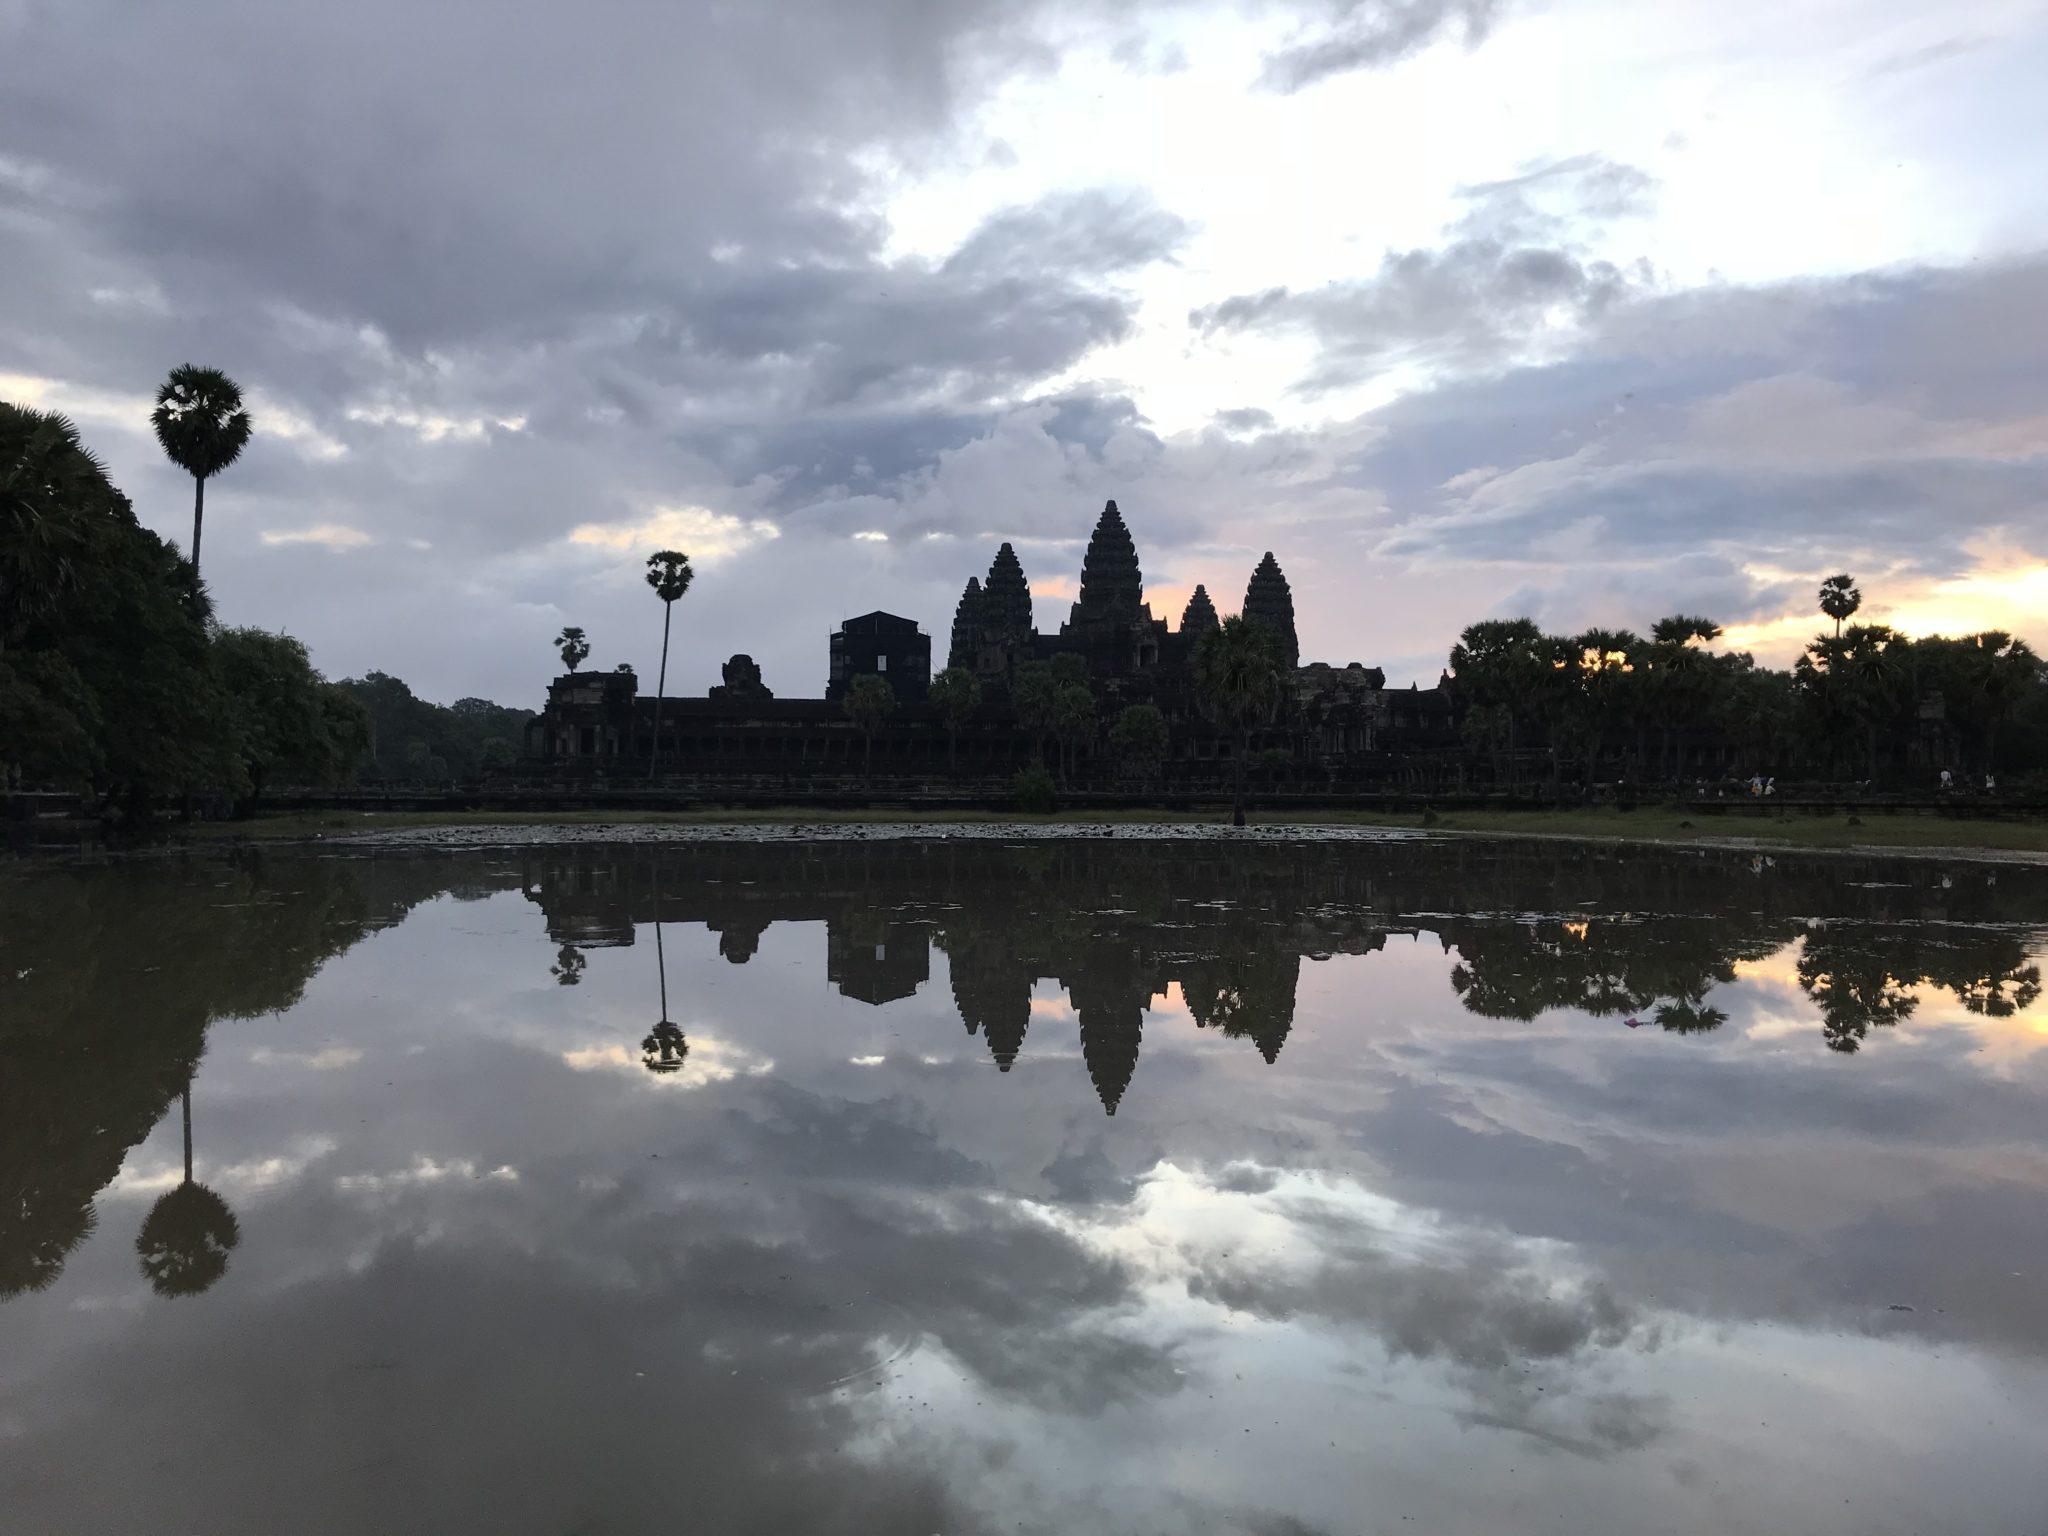 angkor-wat-temples-siem-reap